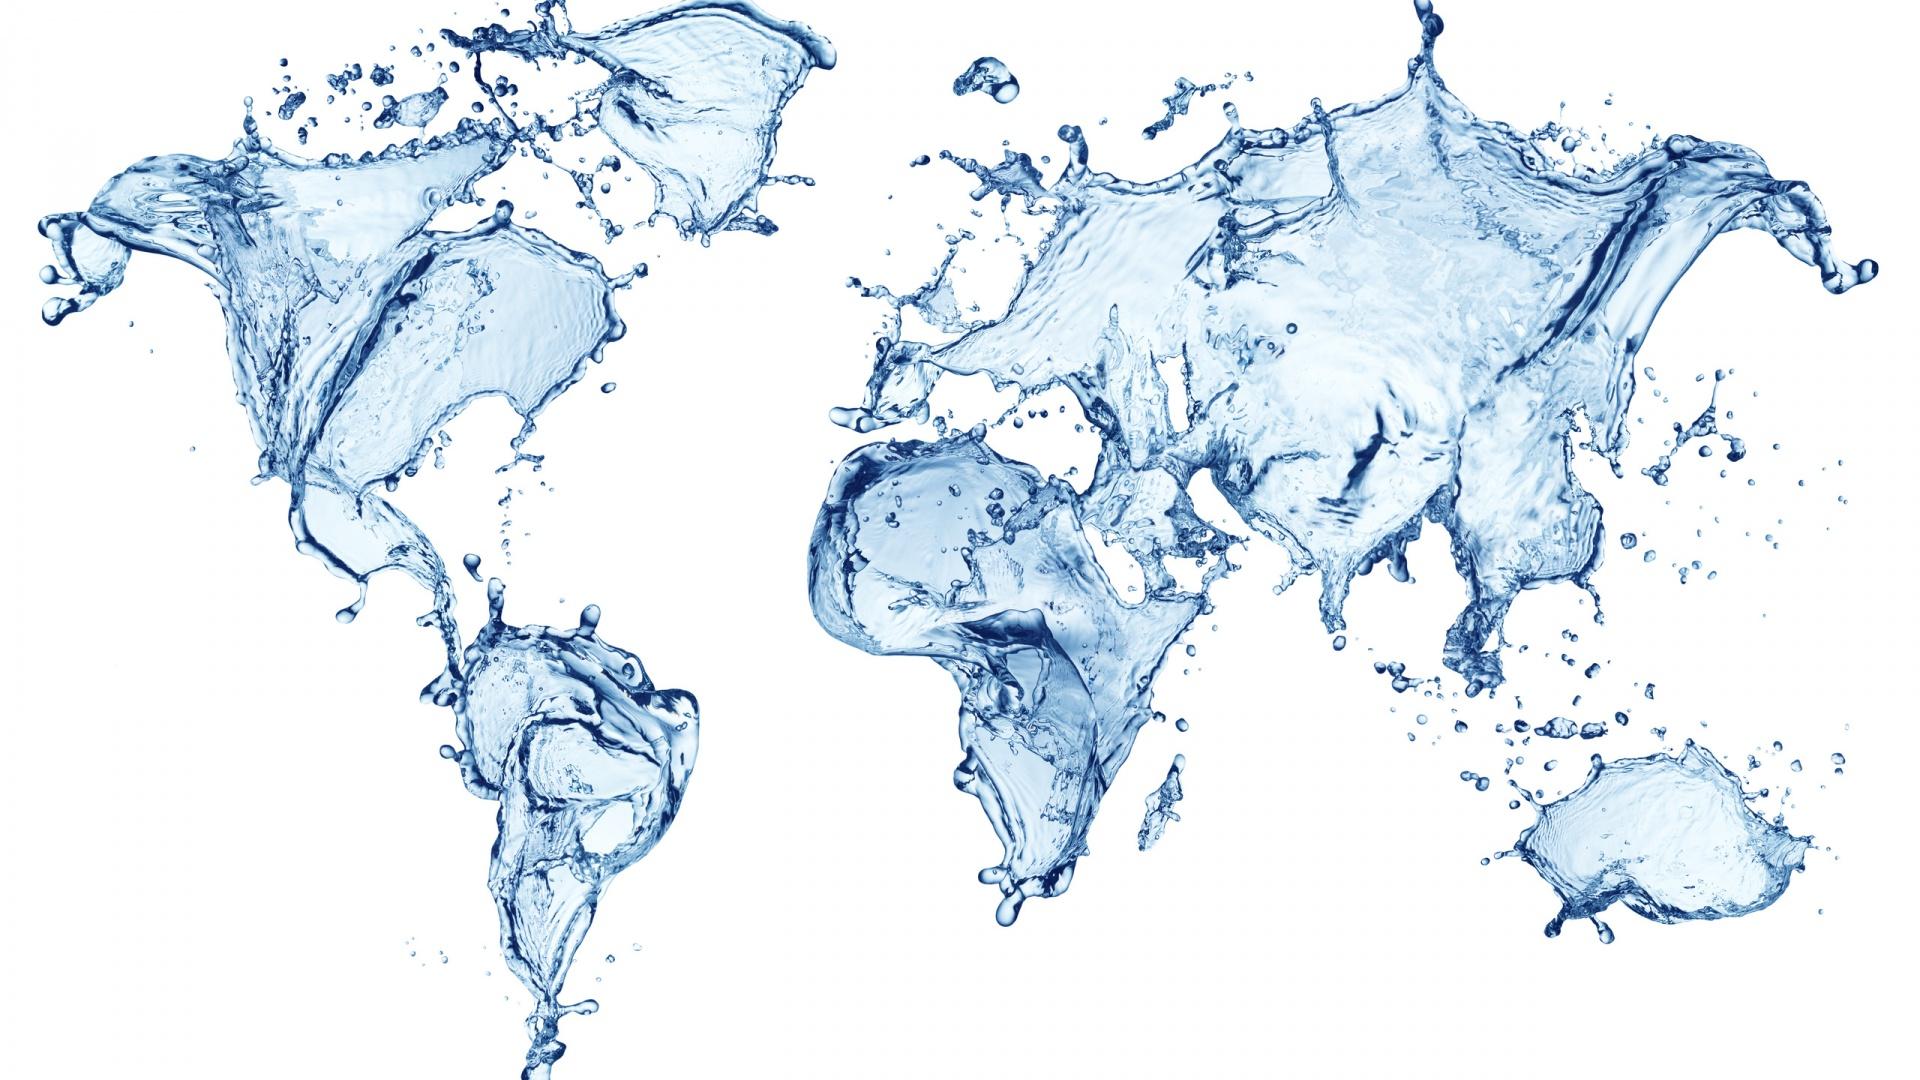 Global map wallpaper wallpapersafari water wallpaper world hd desktop wallpapers 1920x1080 gumiabroncs Gallery